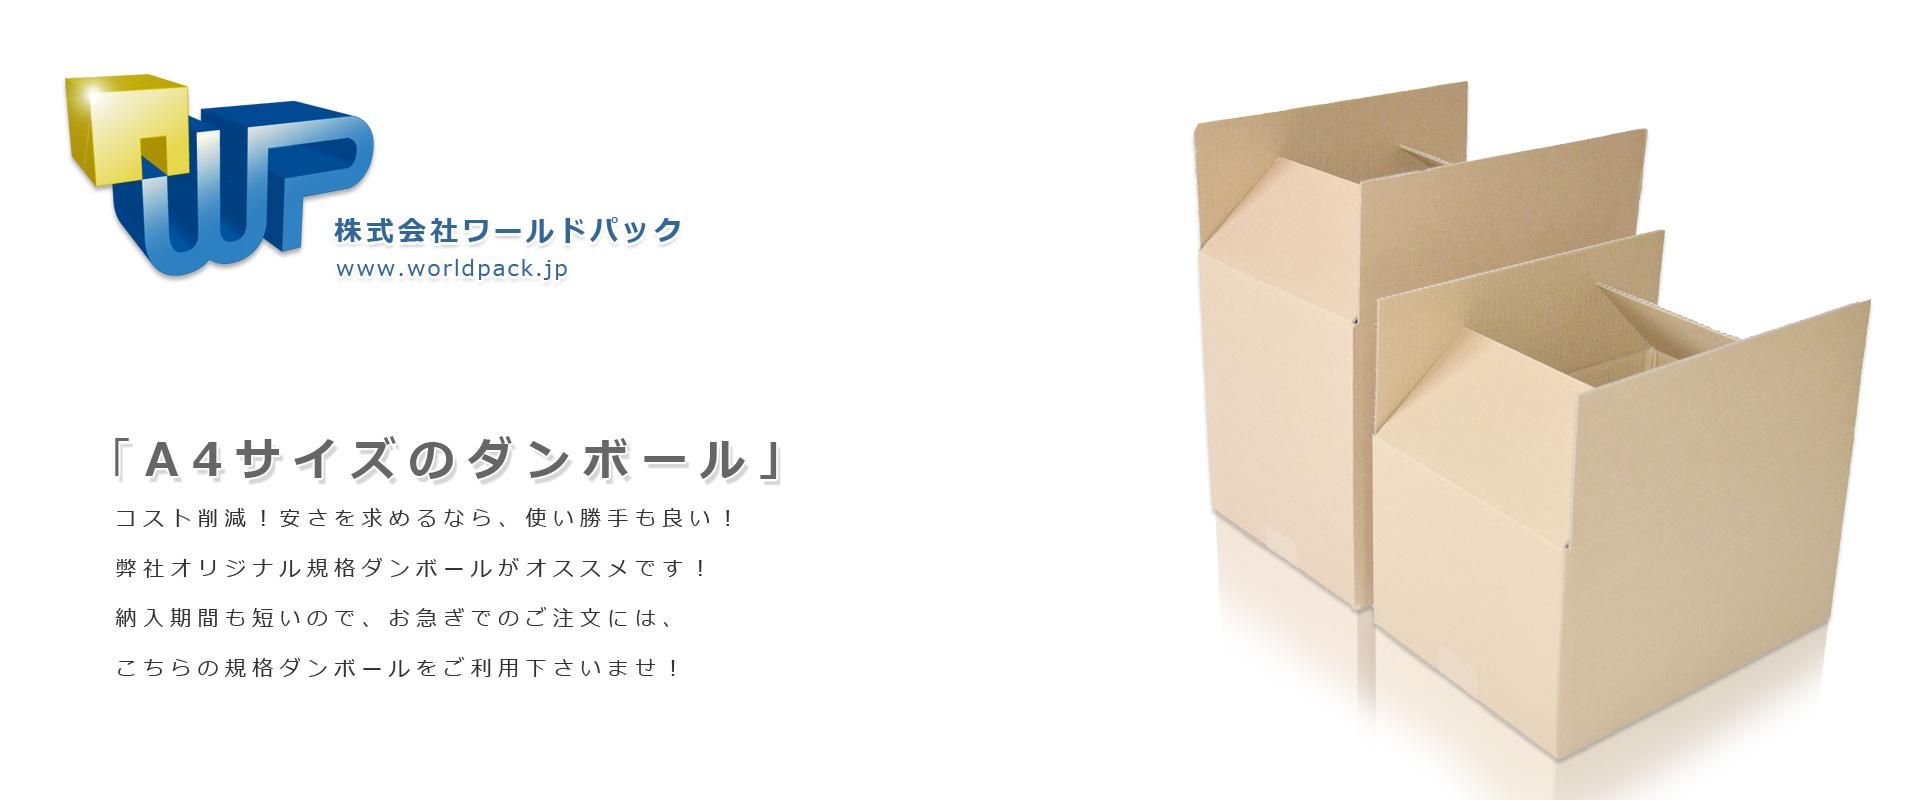 A4サイズの規格ダンボール 小ロット販売OK 株式会社ワールドパック 東京、神奈川、埼玉、千葉、茨城、群馬、栃木